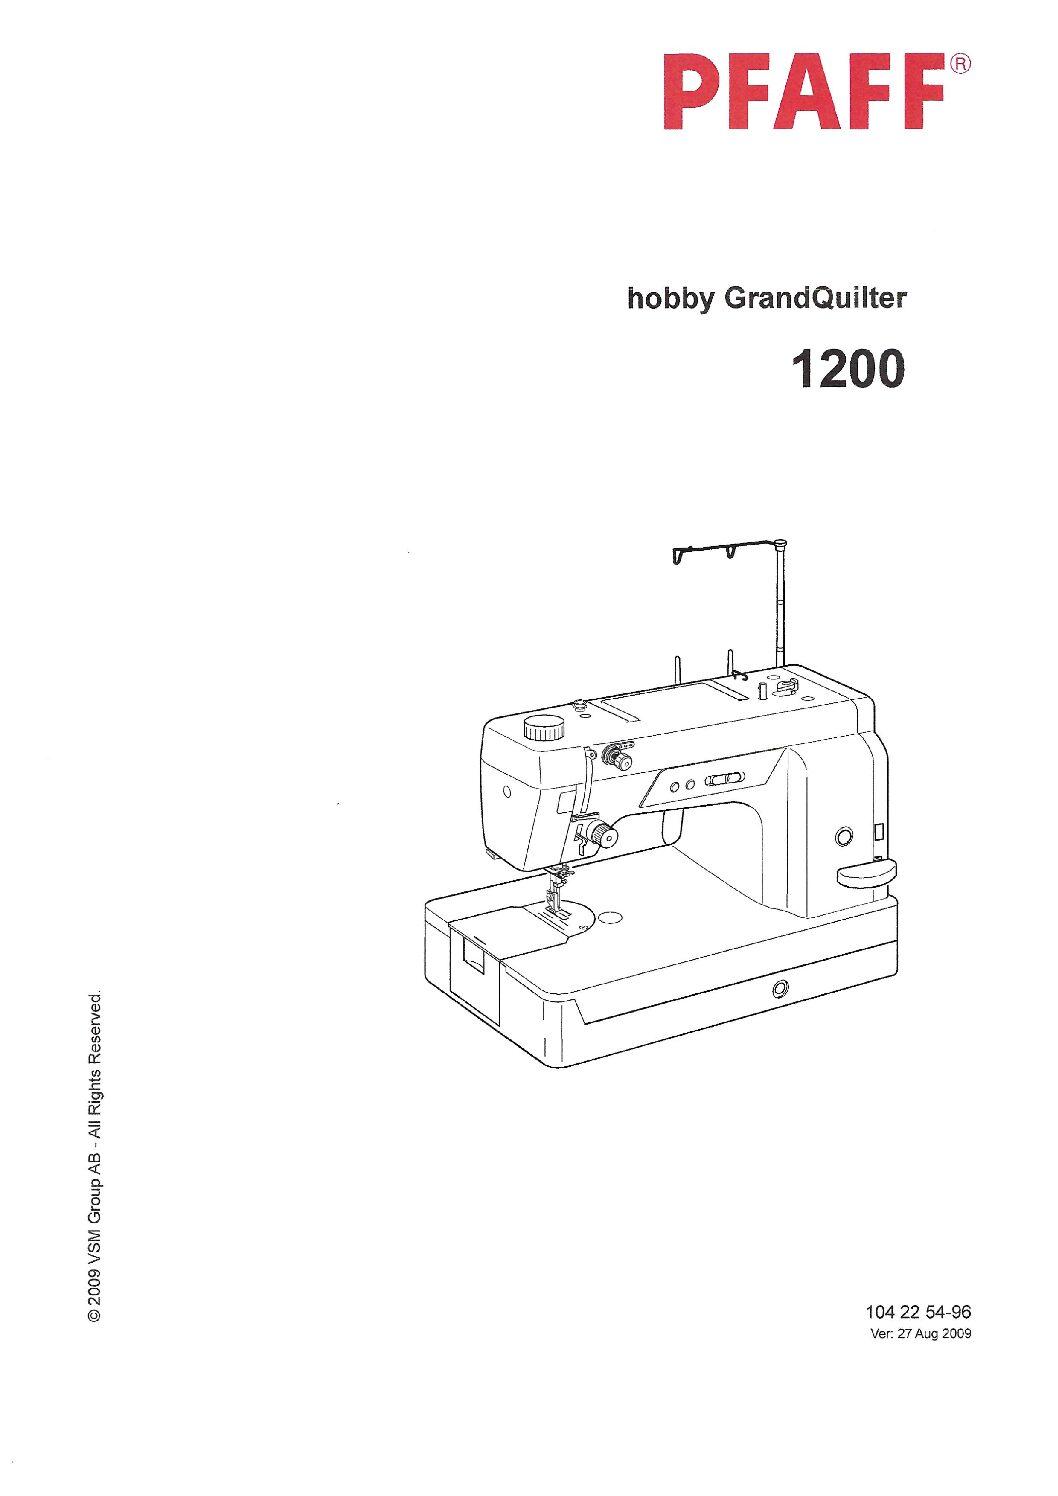 Service Manual Pfaff Hobby 1200 Grand Quilter Sew Machine